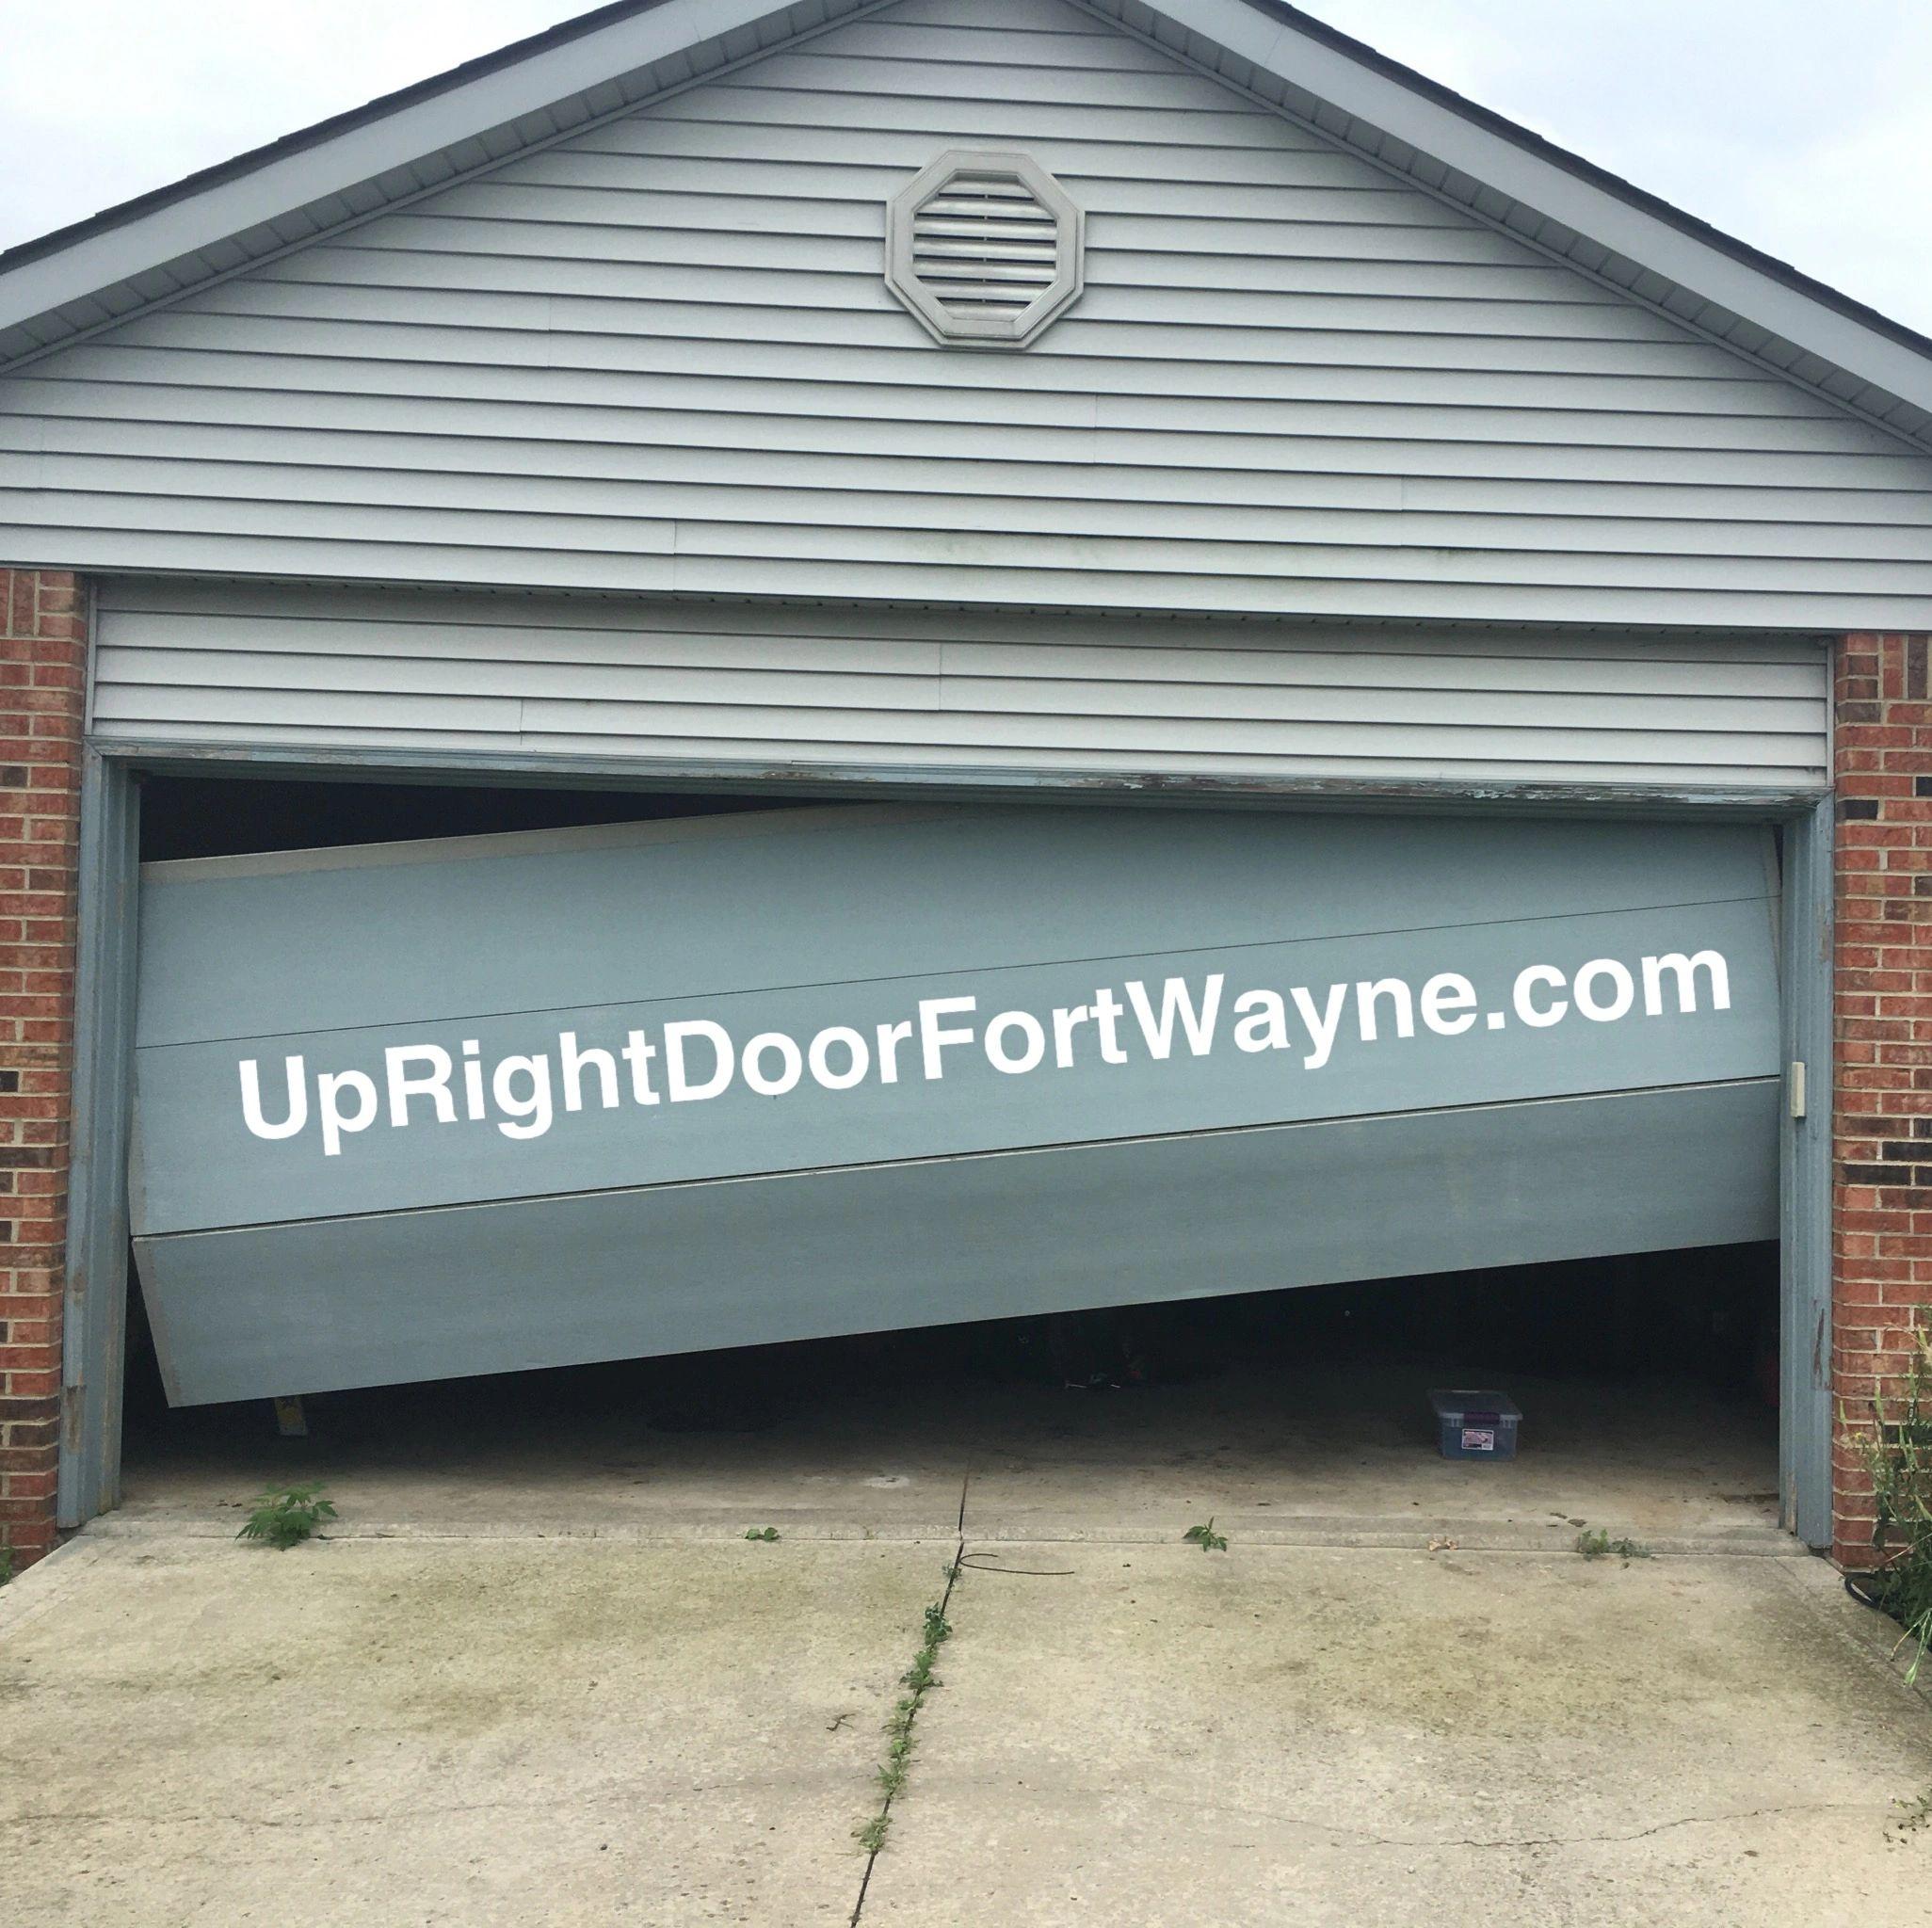 Upright door fort wayne rubansaba